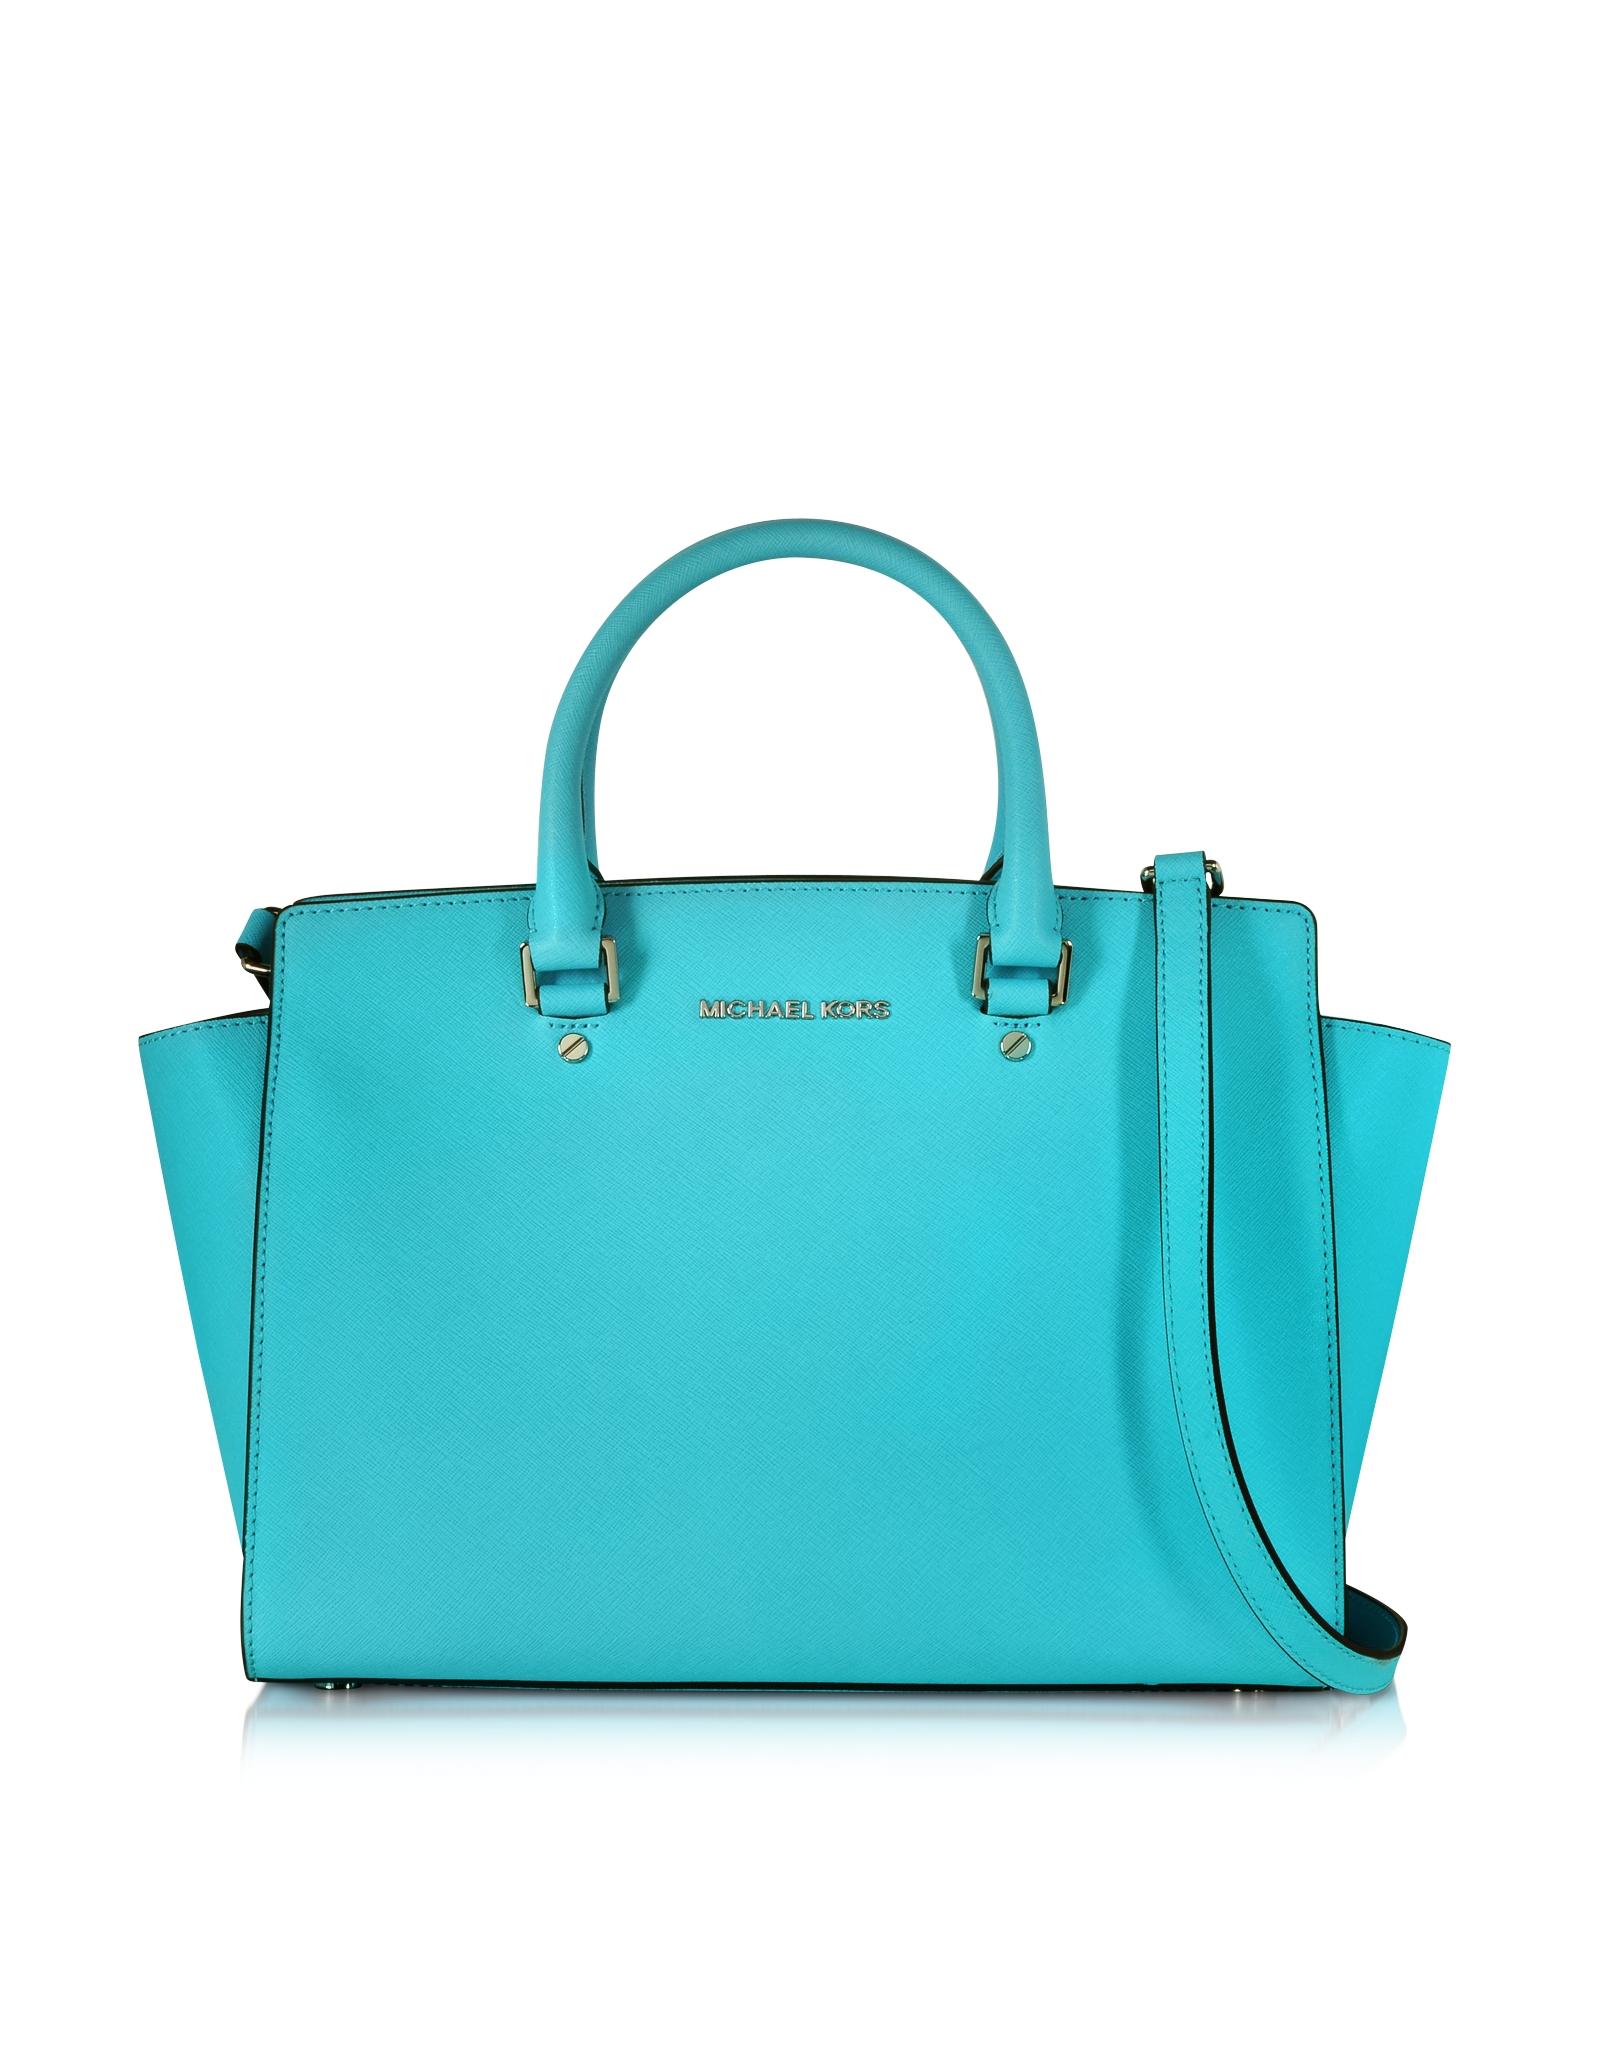 Michael Kors Sutton Medium Satchel Aquamarine Bag Gallery Womens By Selma